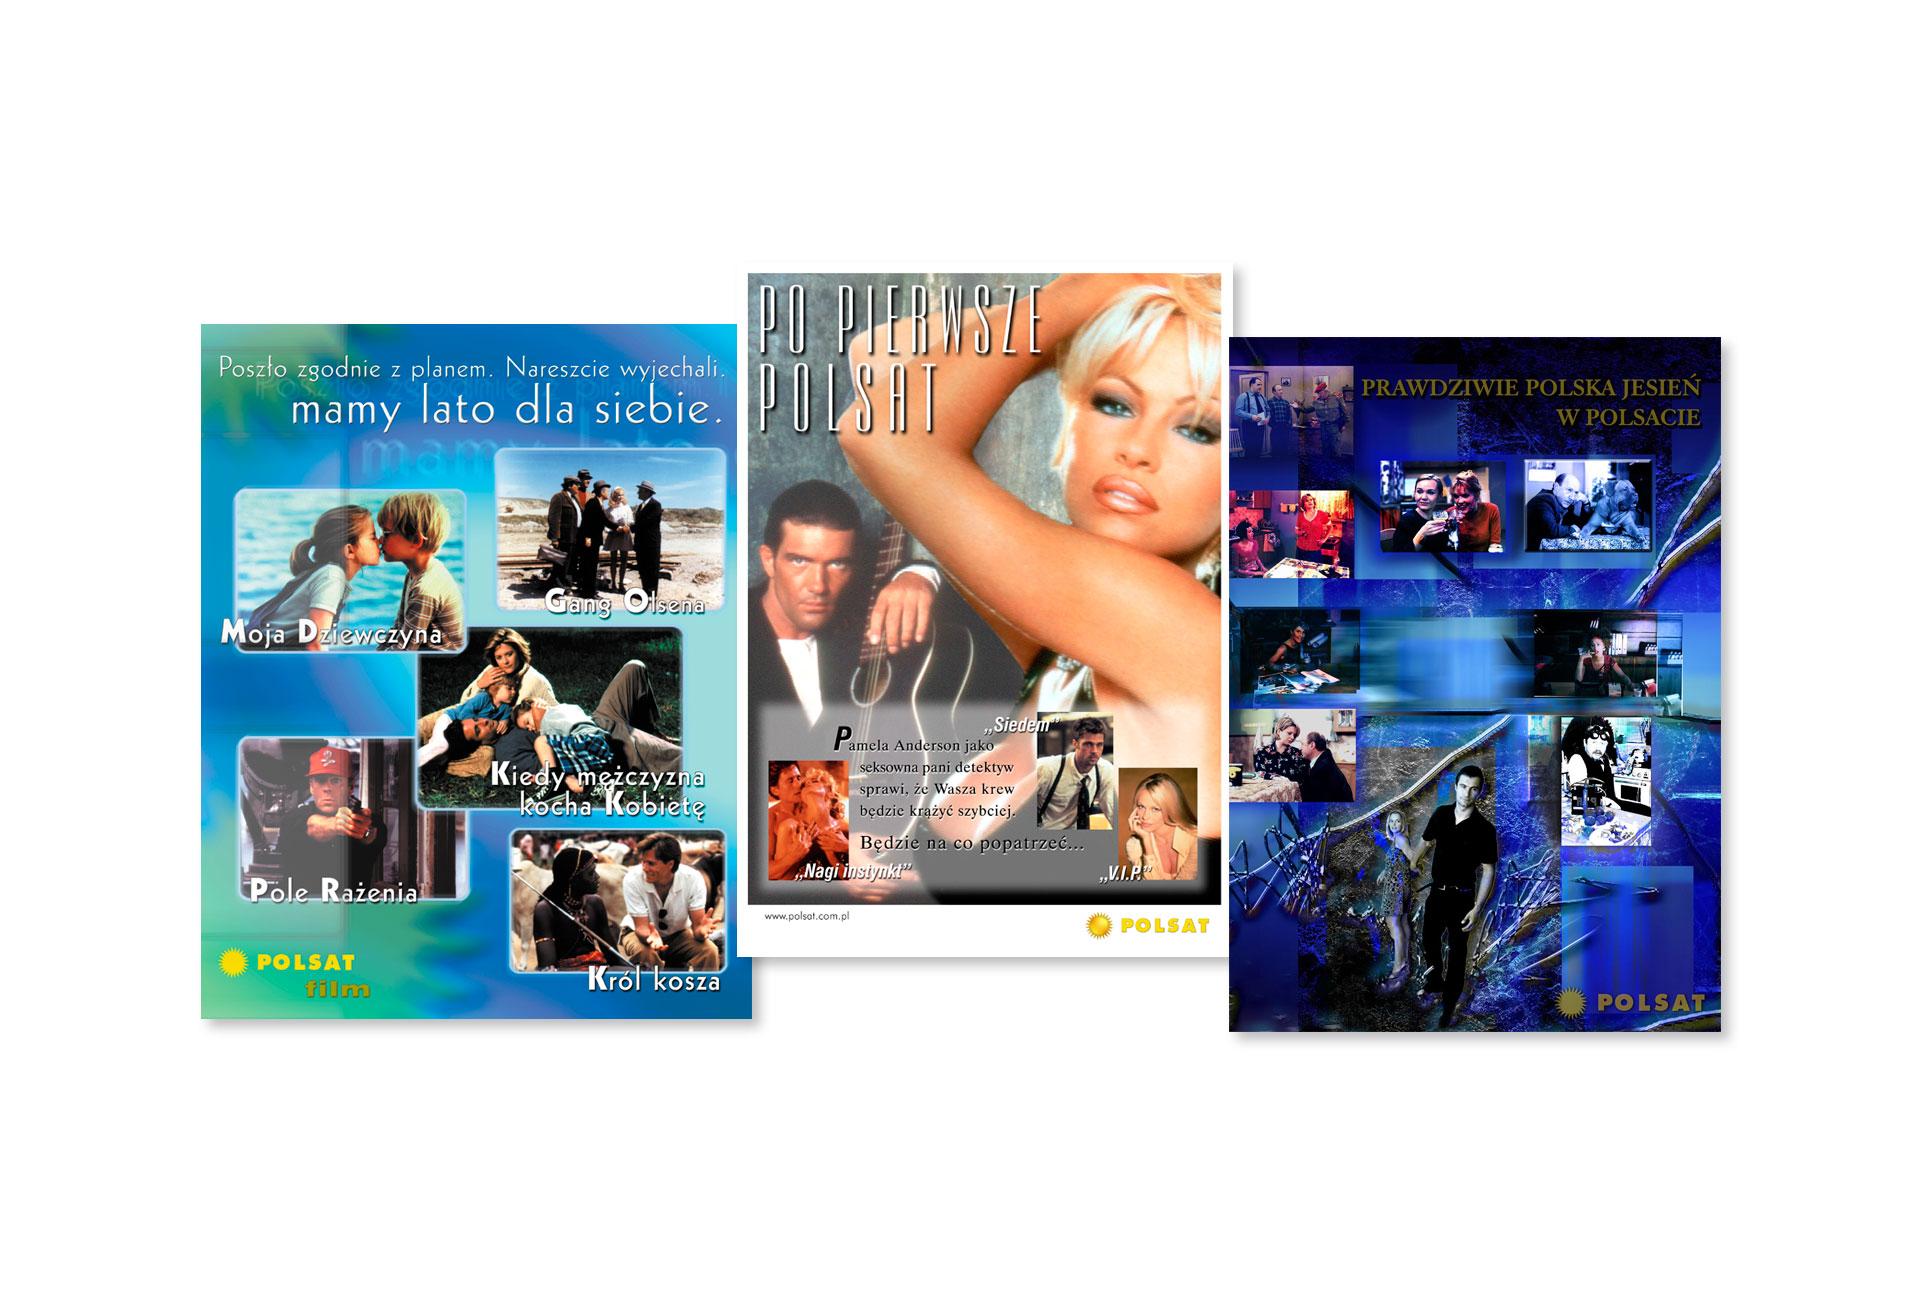 polsat programy 2000